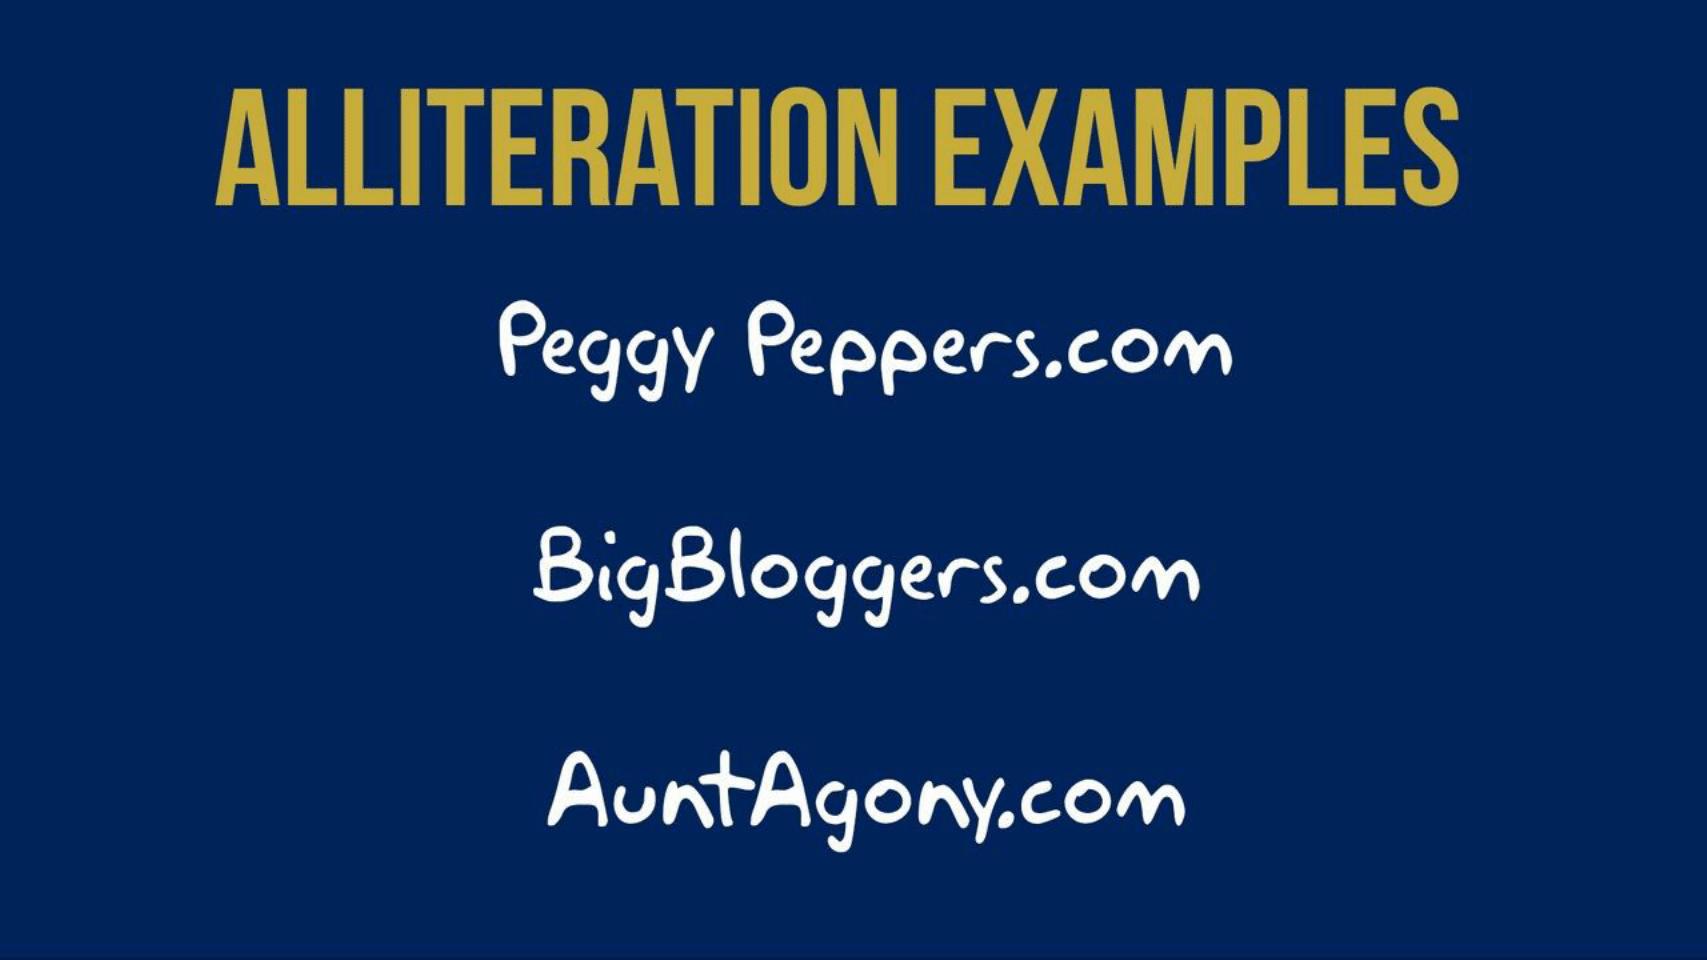 alliteration-blog-names